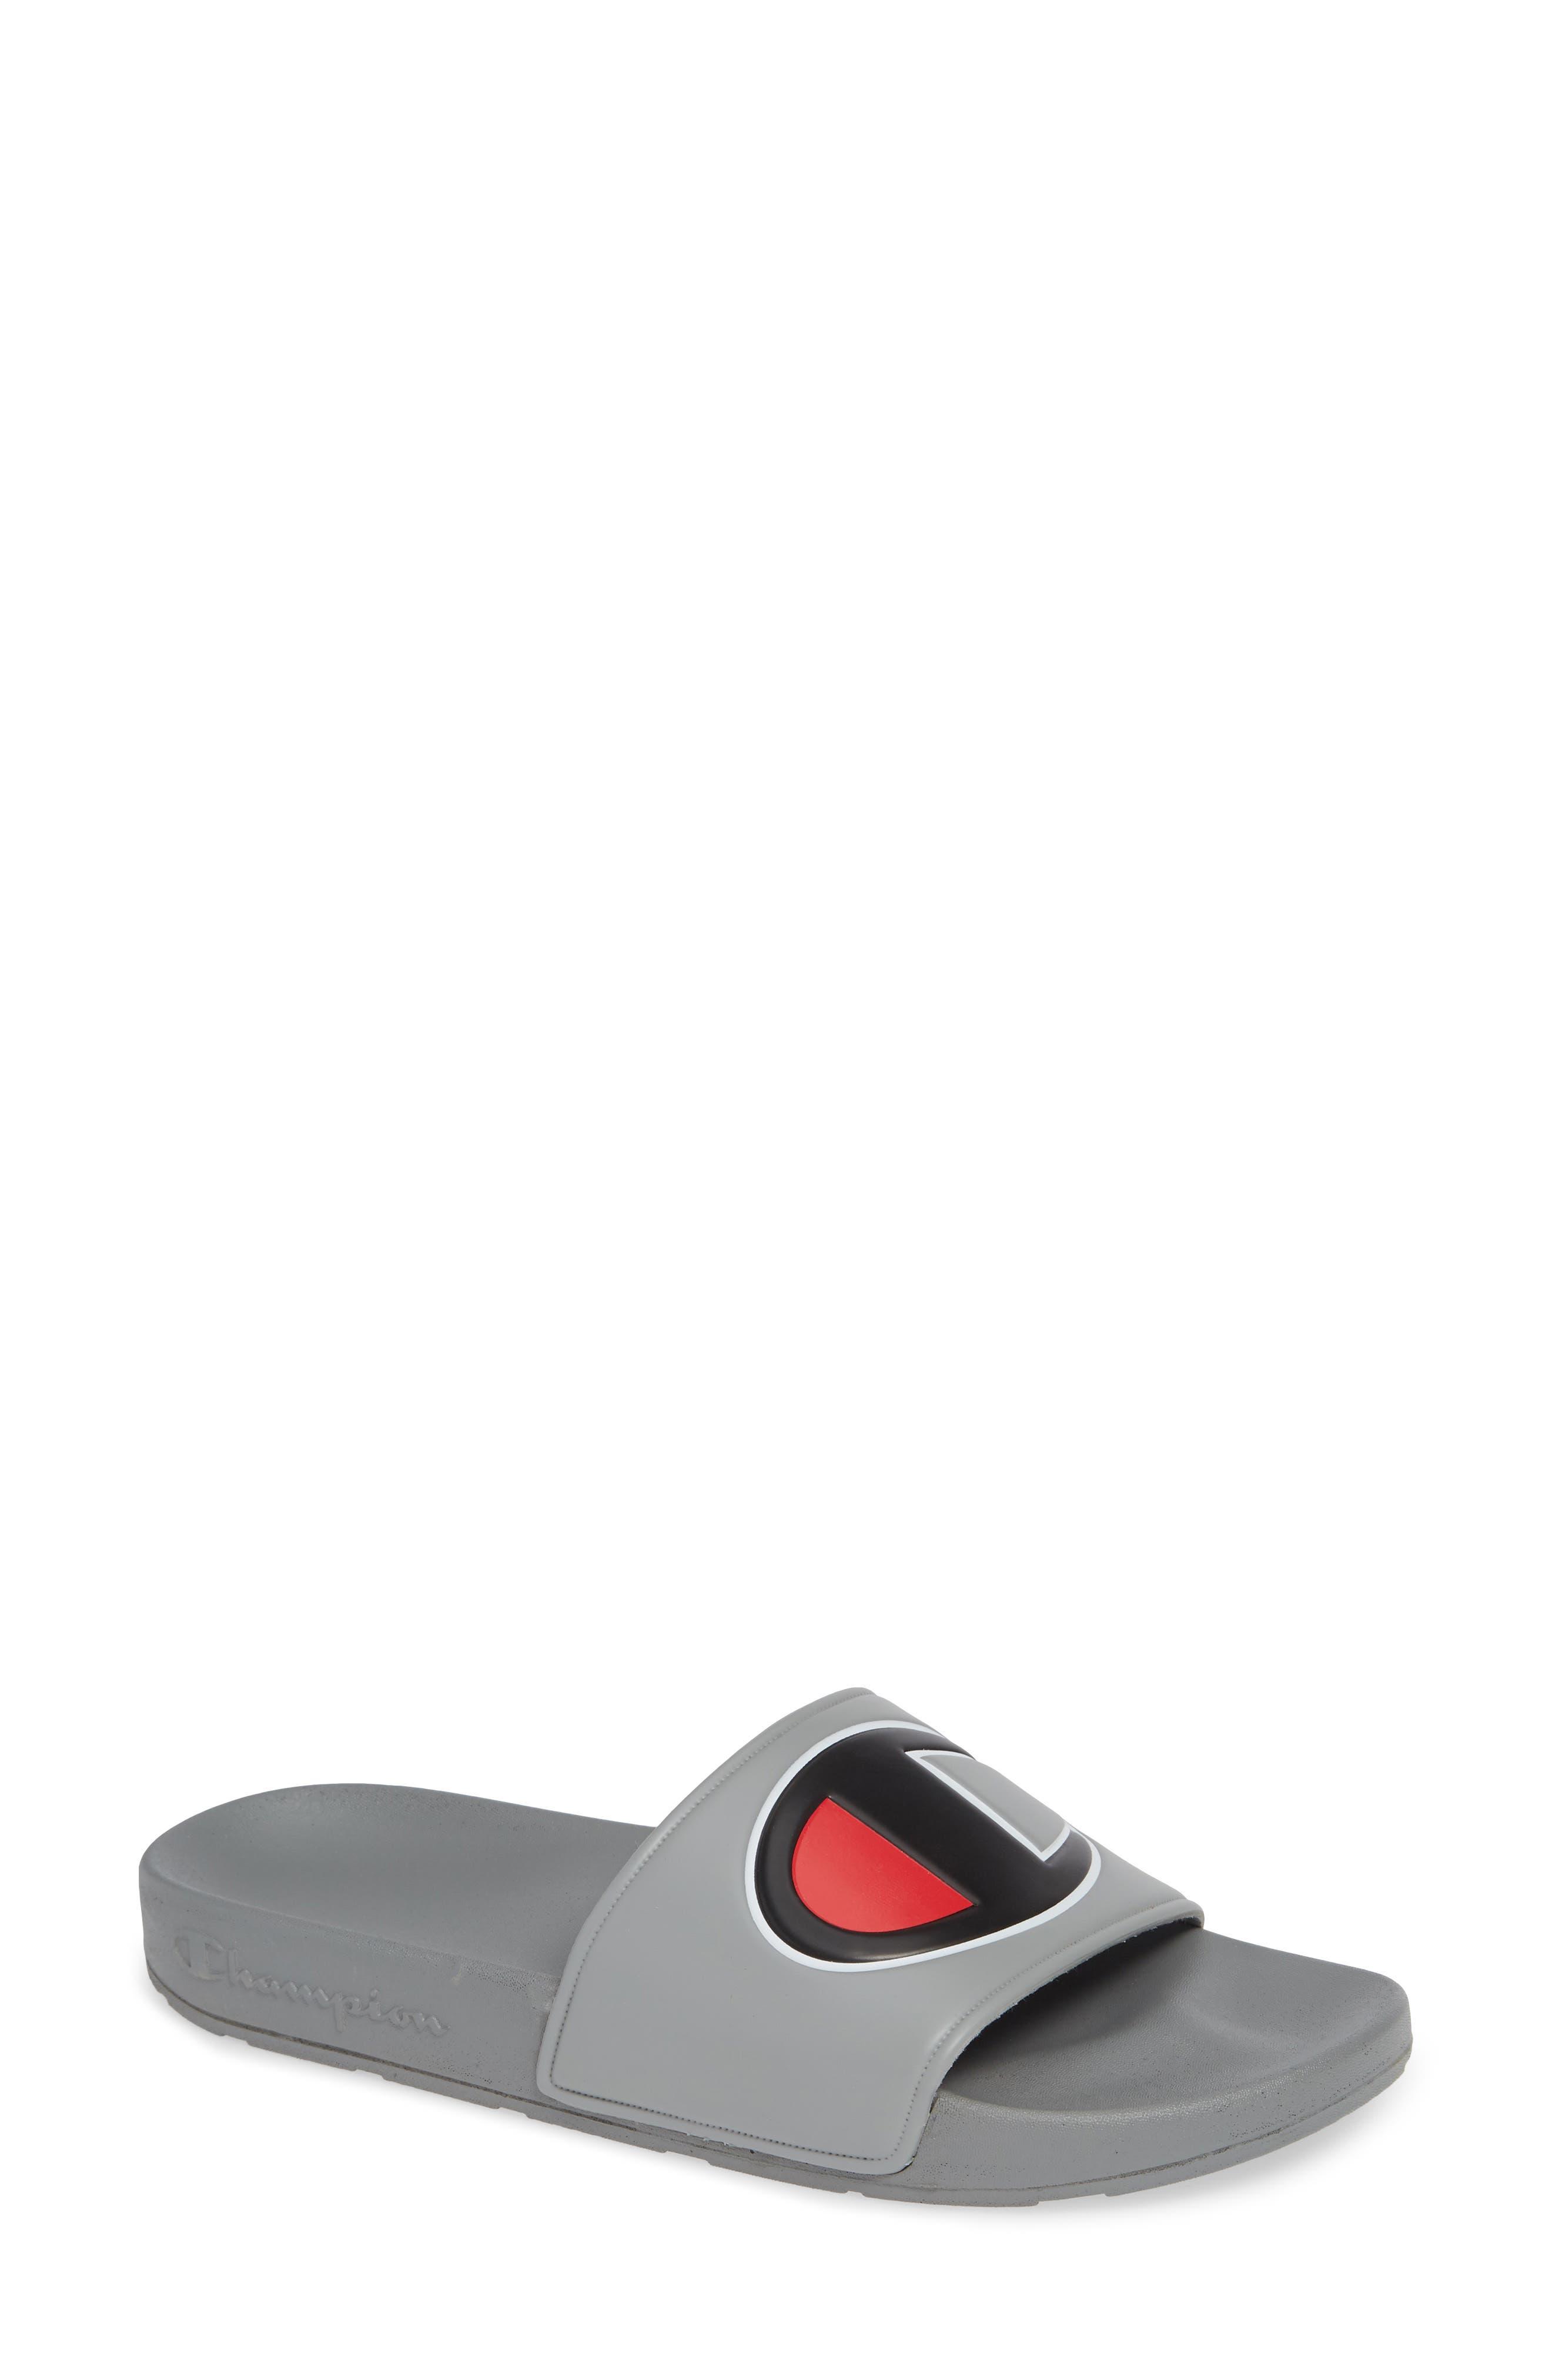 Slide Sandal,                             Main thumbnail 1, color,                             020